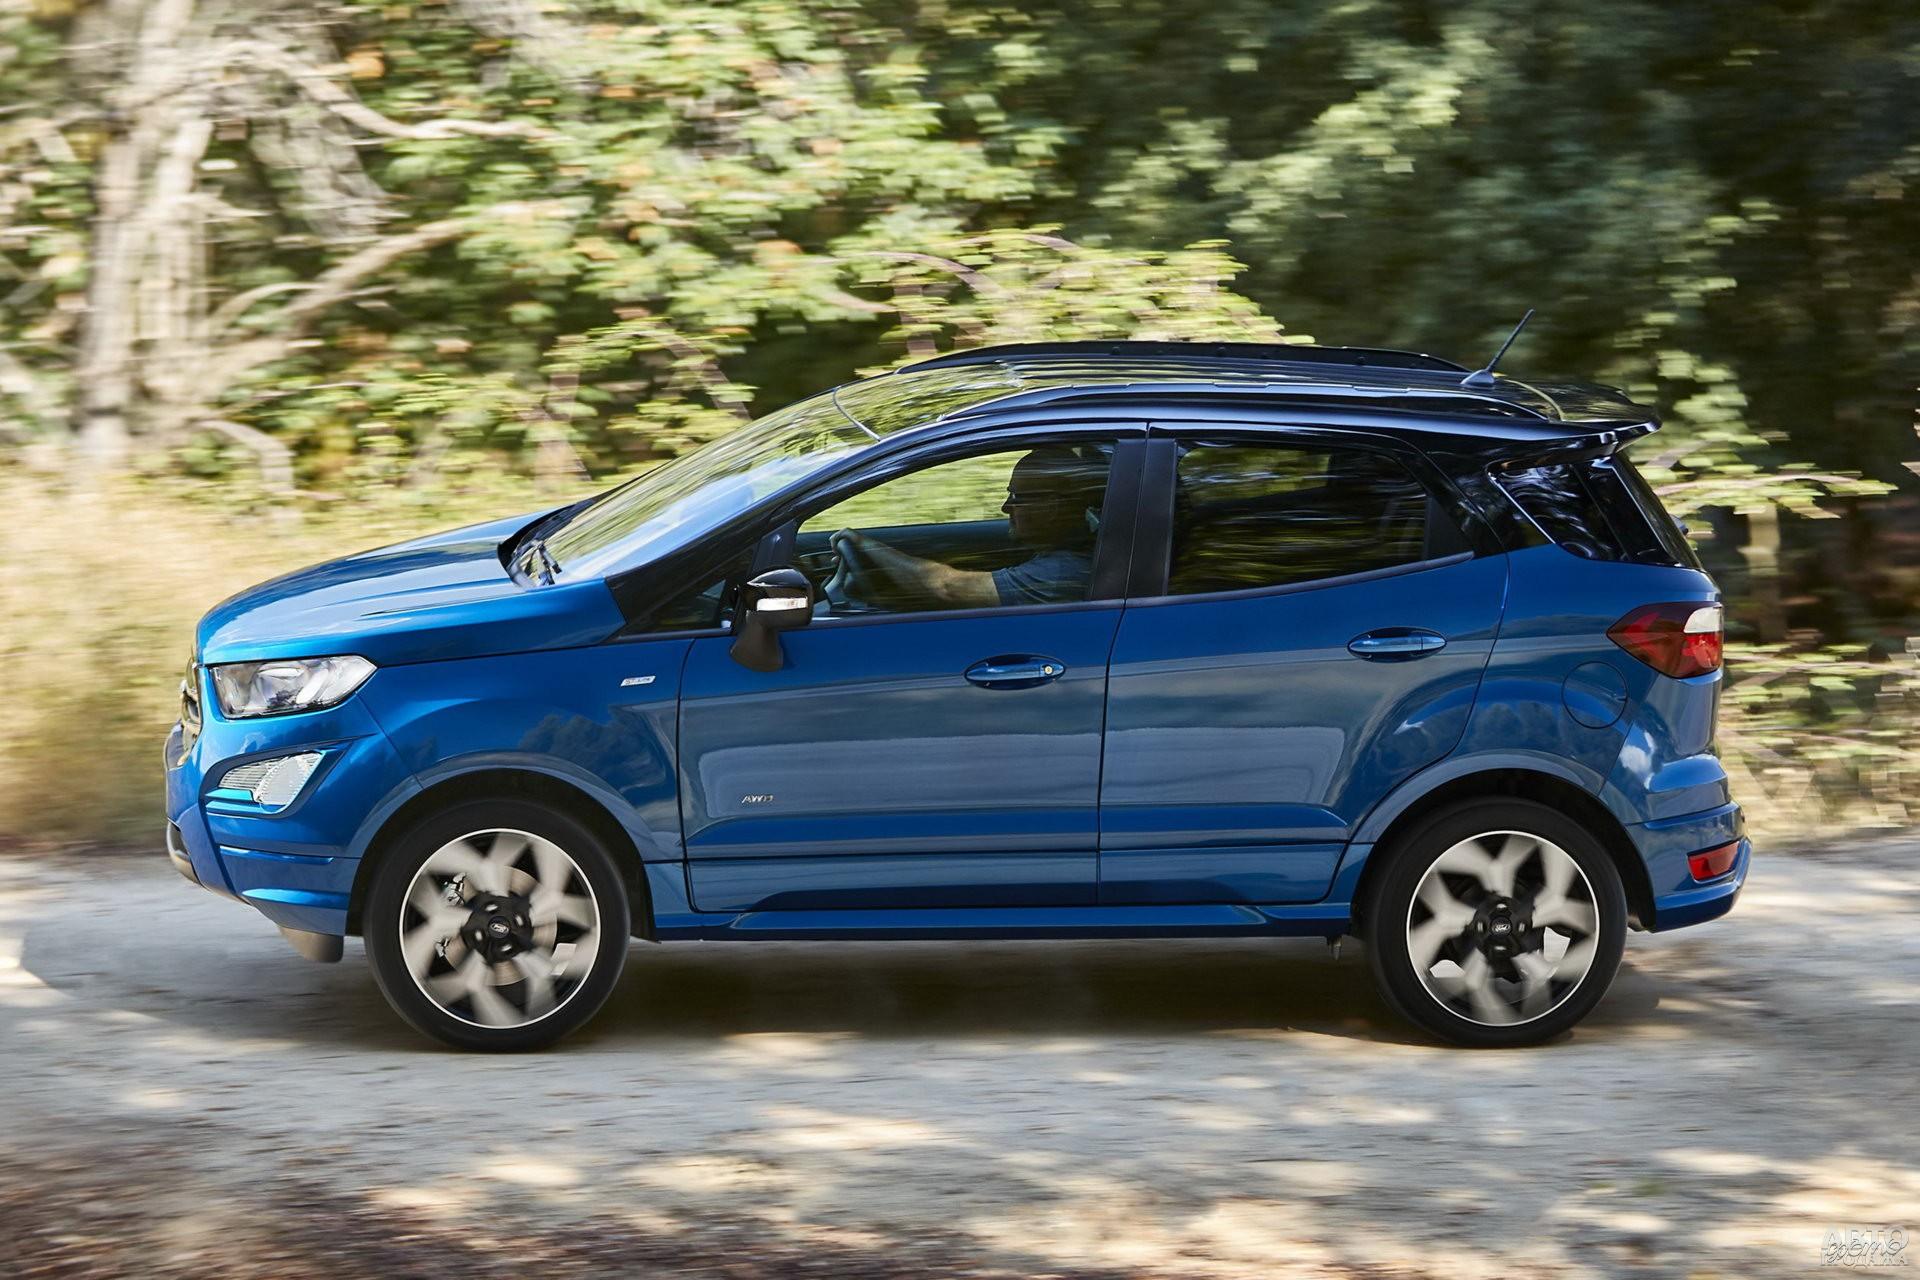 Ford заметно тяжелее соперников - 1349 кг